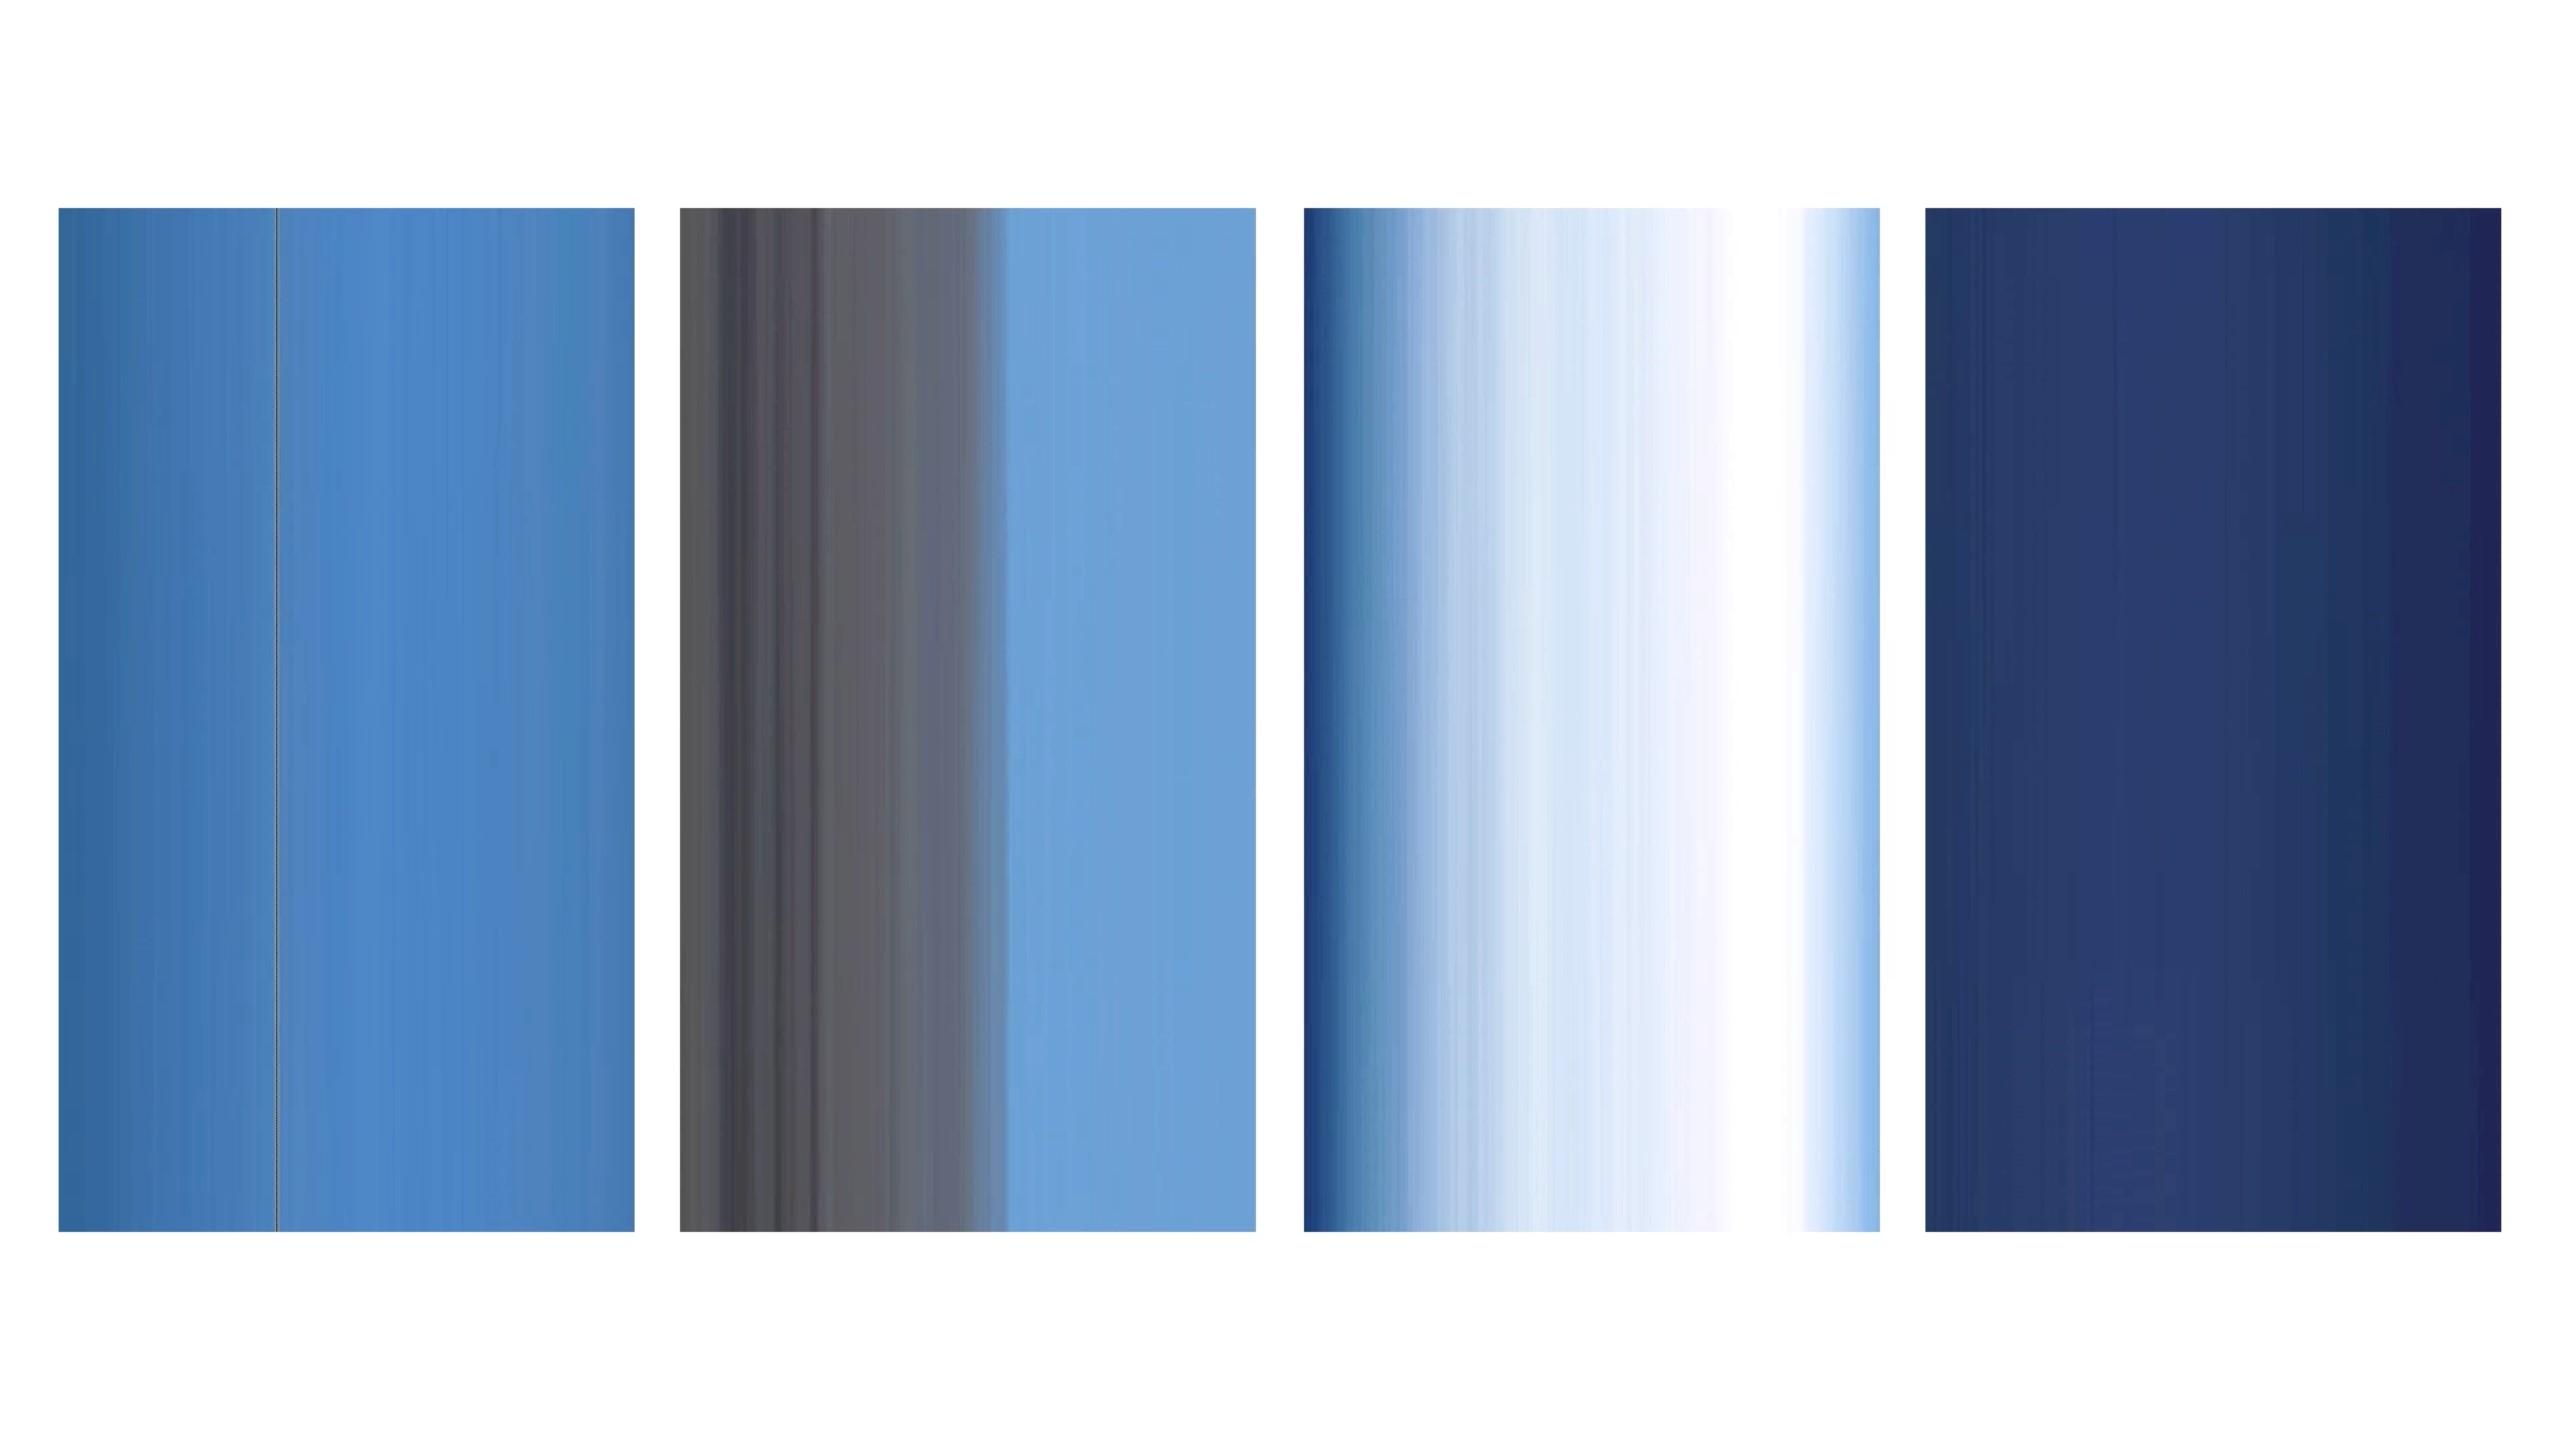 2014-06-02-WTCin4momentsscreencapture1second2.jpg